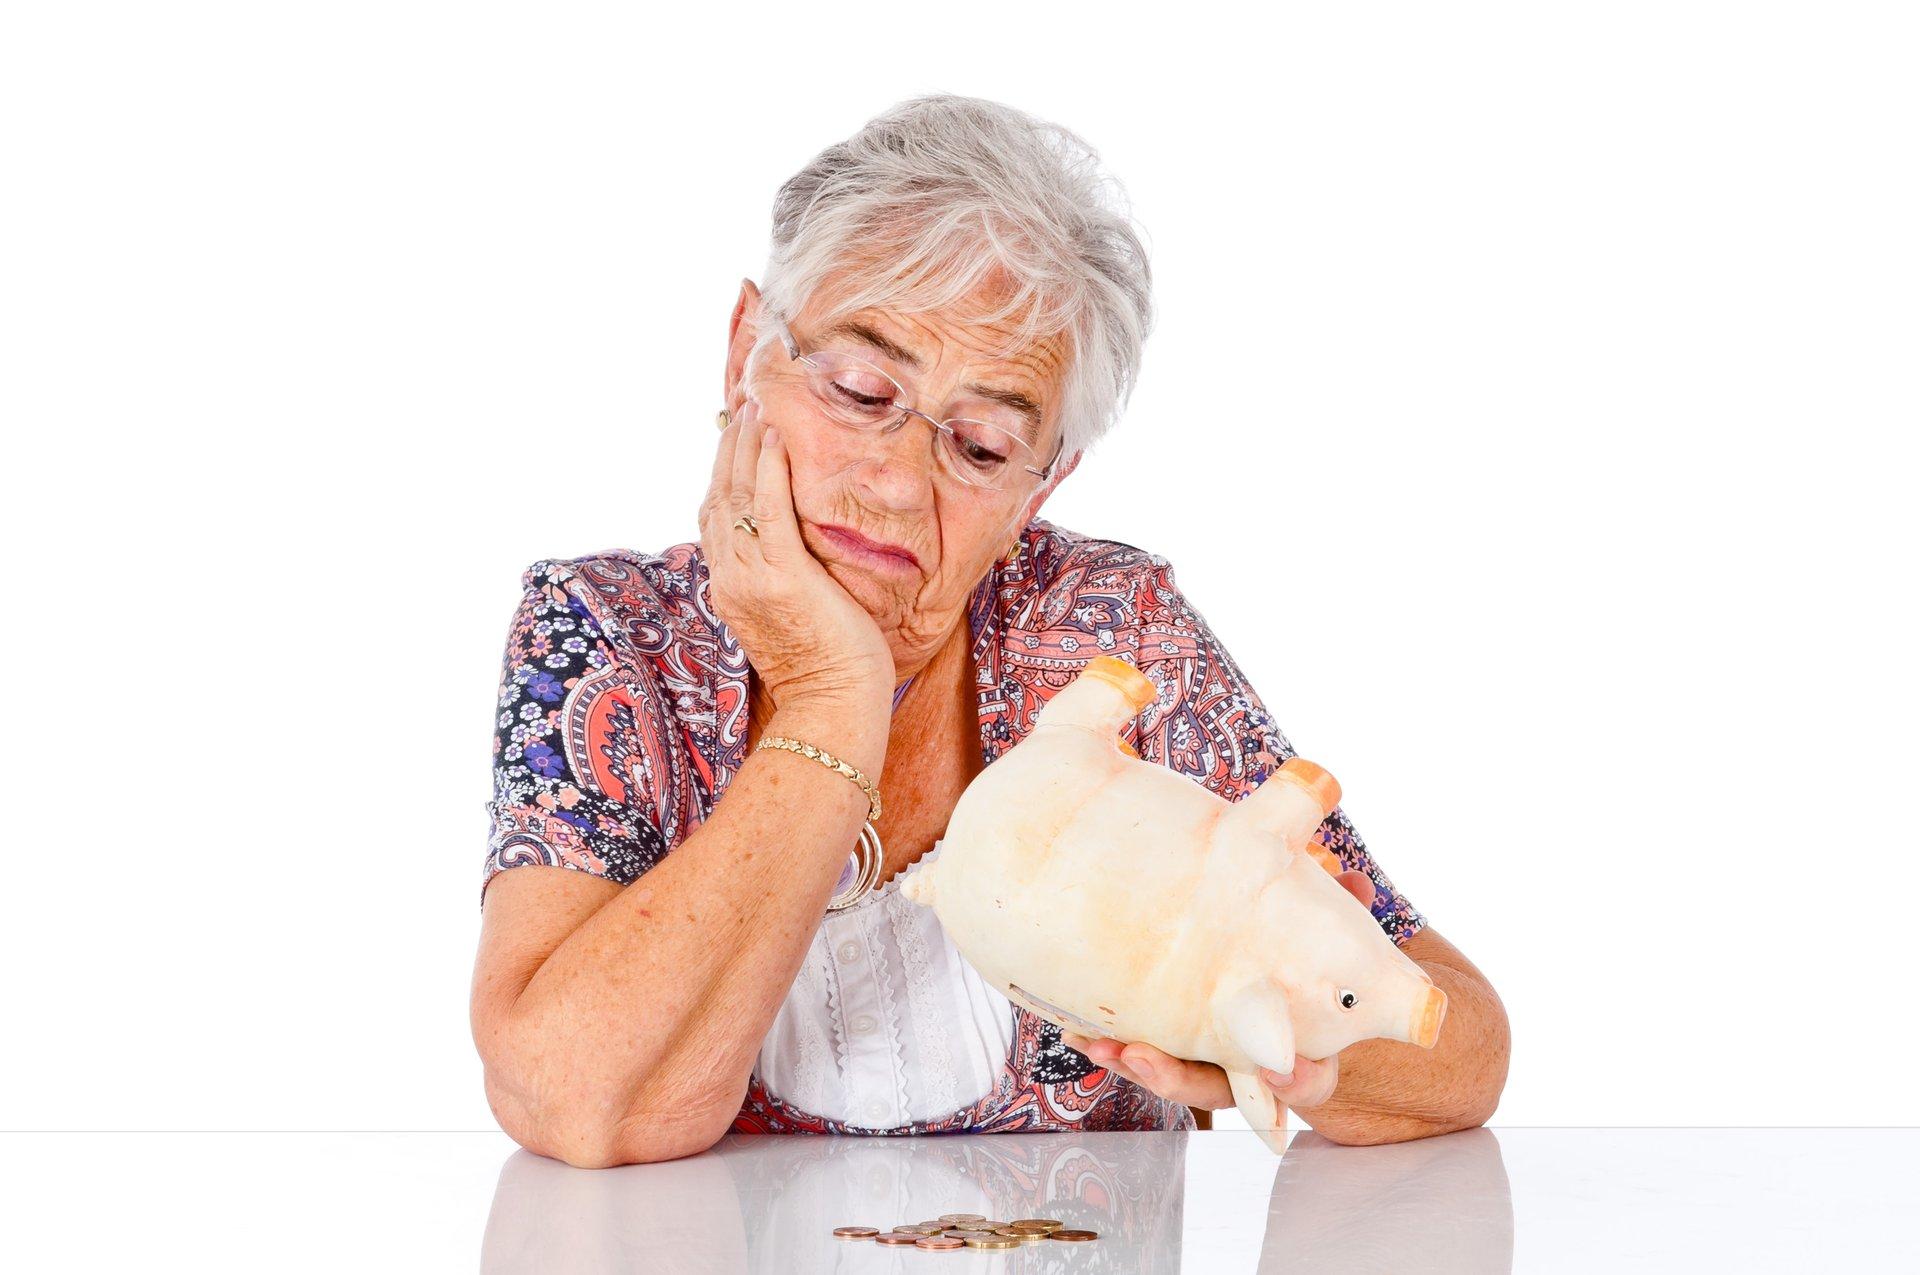 Senior woman with no money